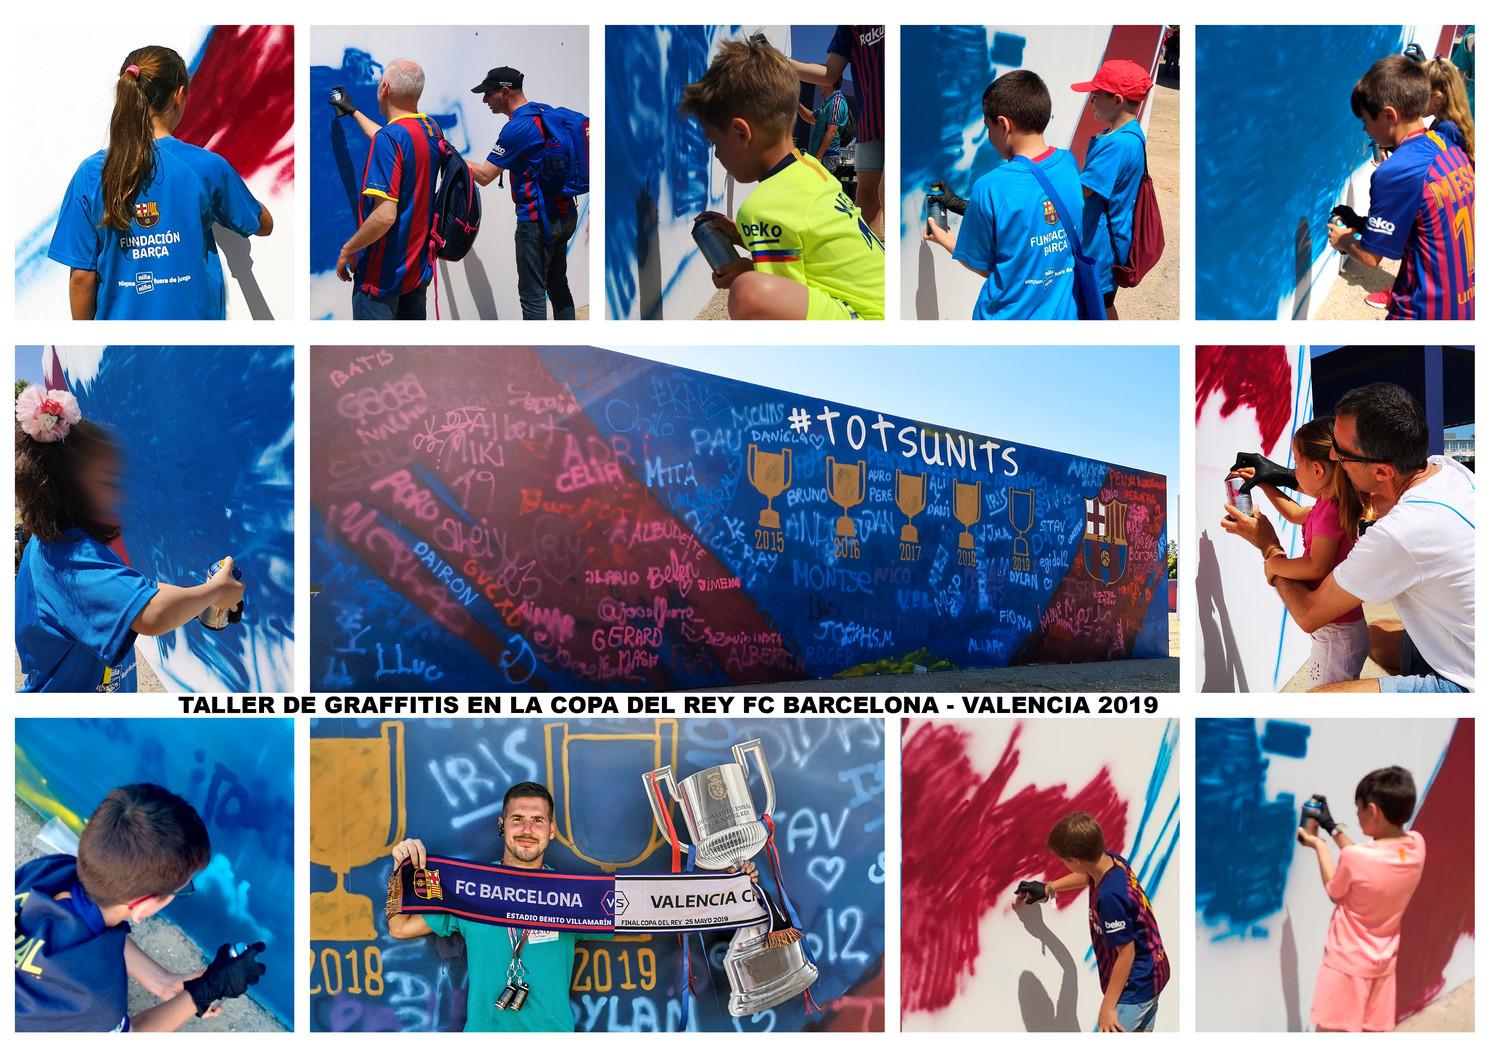 Taller de Graffitis en la Copa del Rey FC Barcelona - Valencia 2019